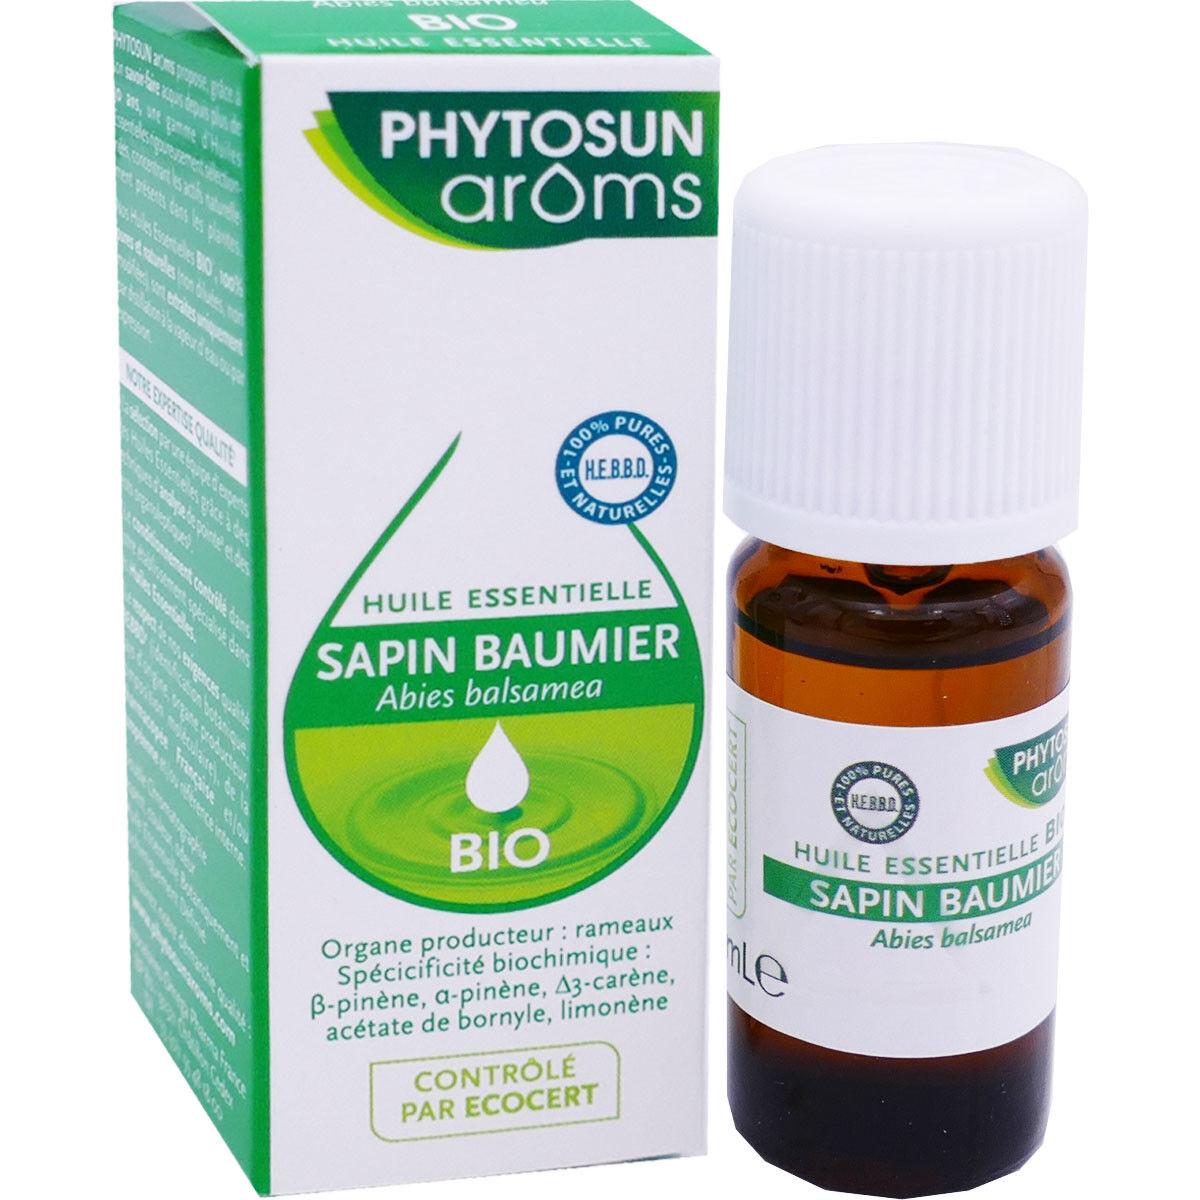 Phytosun aroms huile essentielle bio sapin baumier 10ml